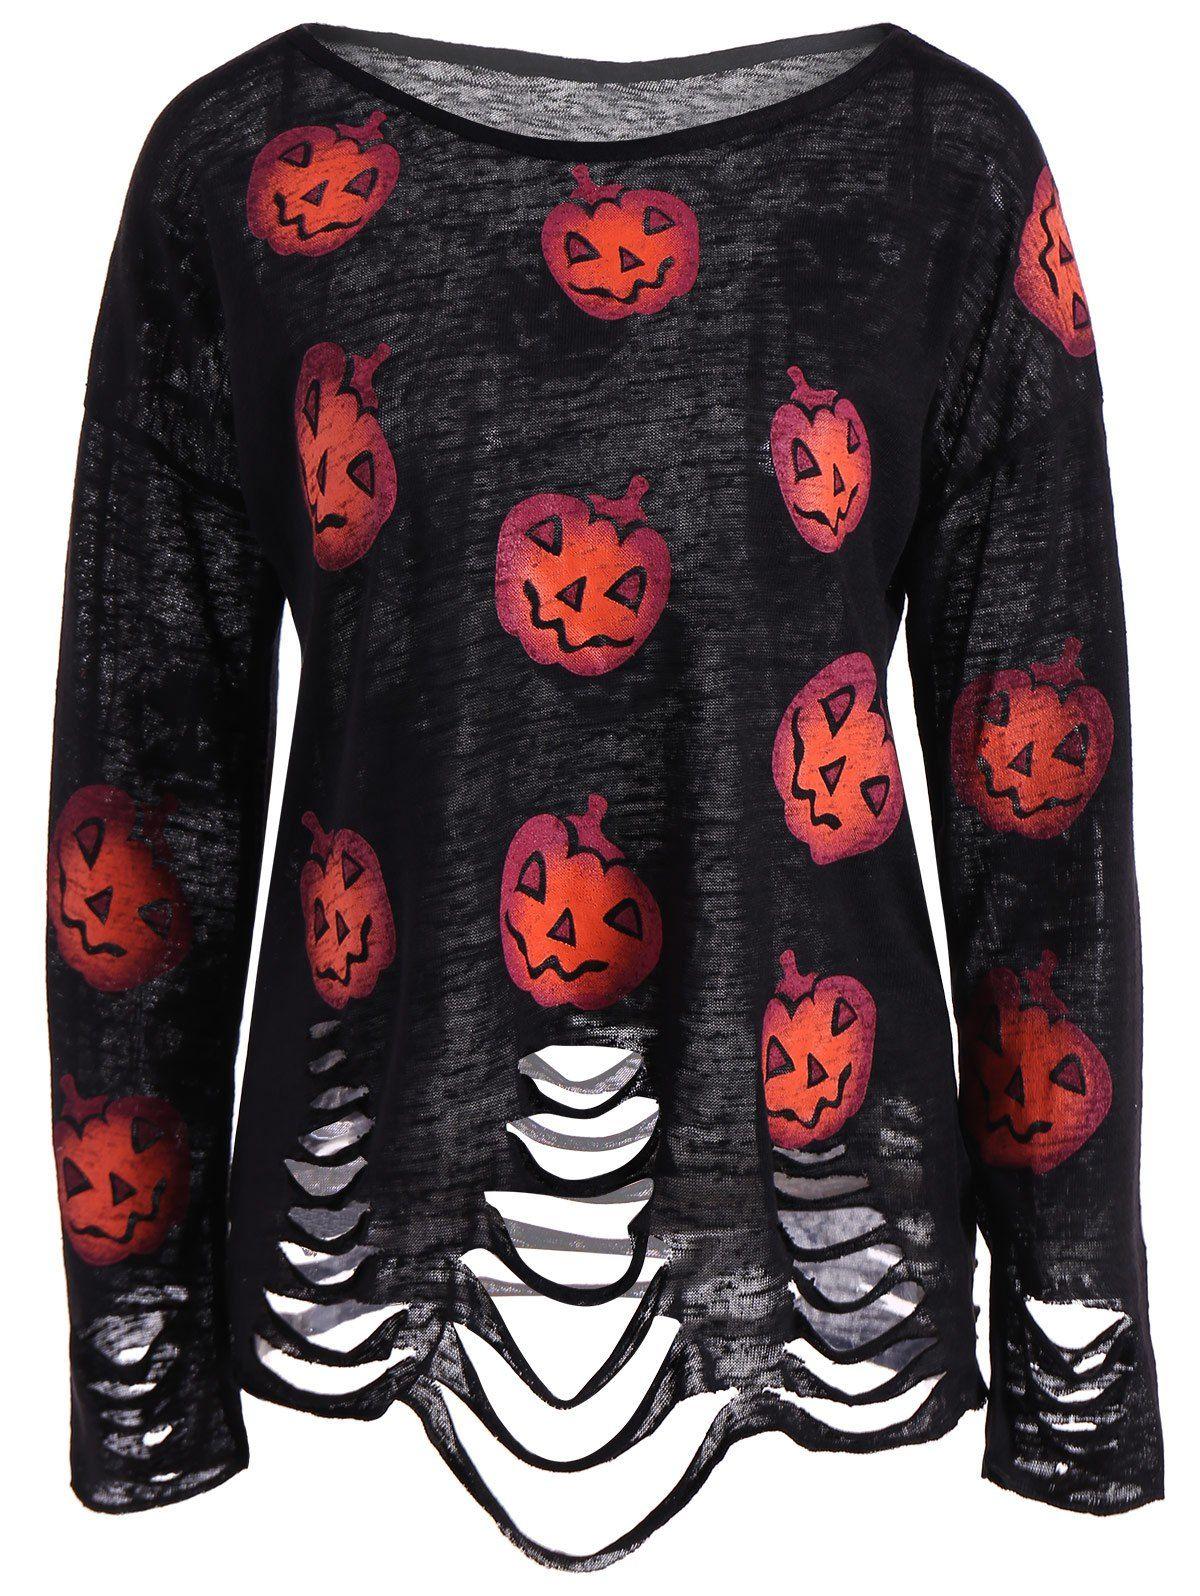 Pumpkin Halloween Ripped Knitwear In Black L Sammydress Com Halloween Fashion Halloween Outfits Clothes